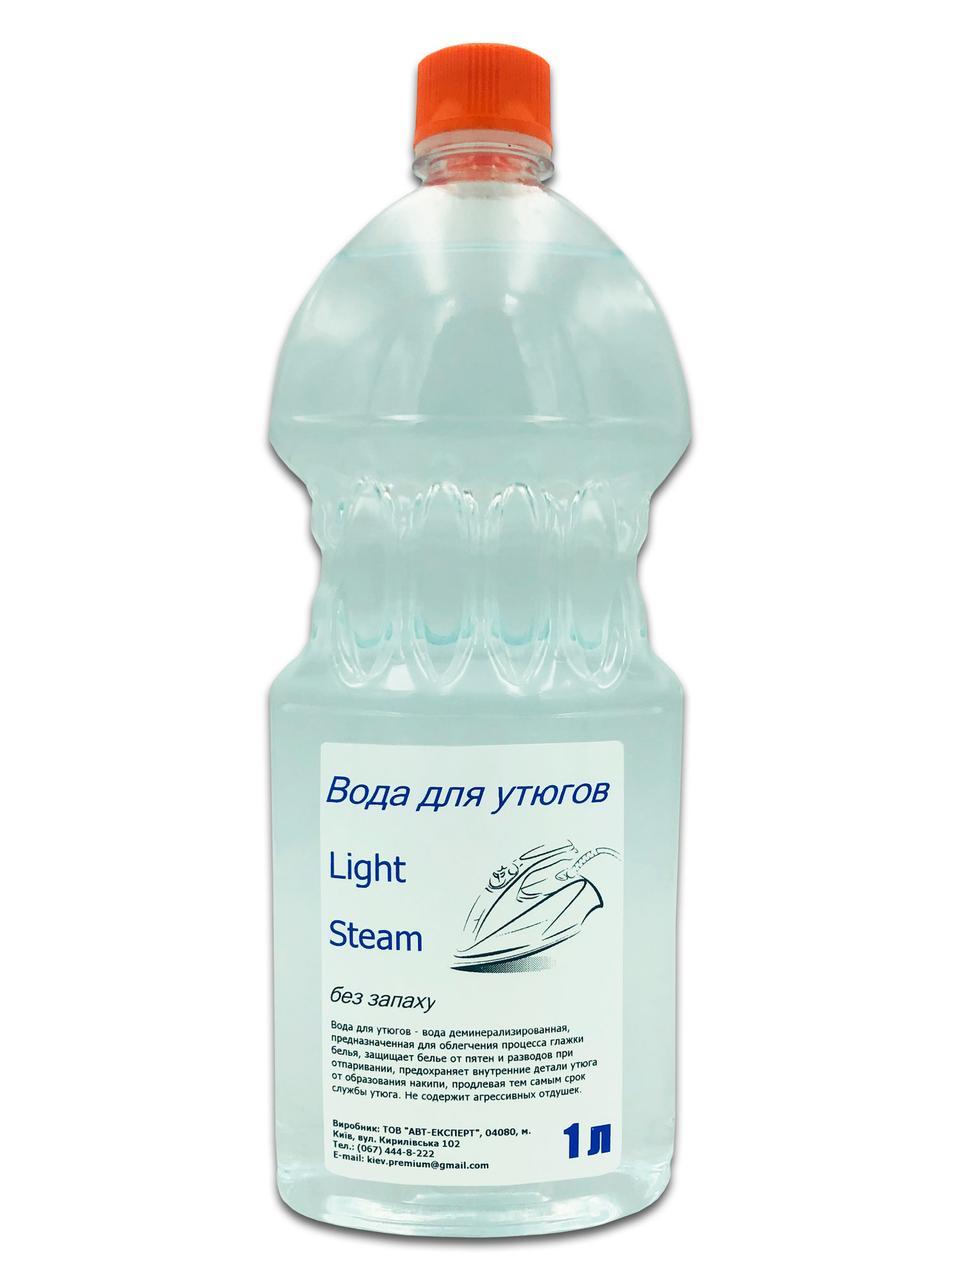 Вода для прасок Light Steam 1 л